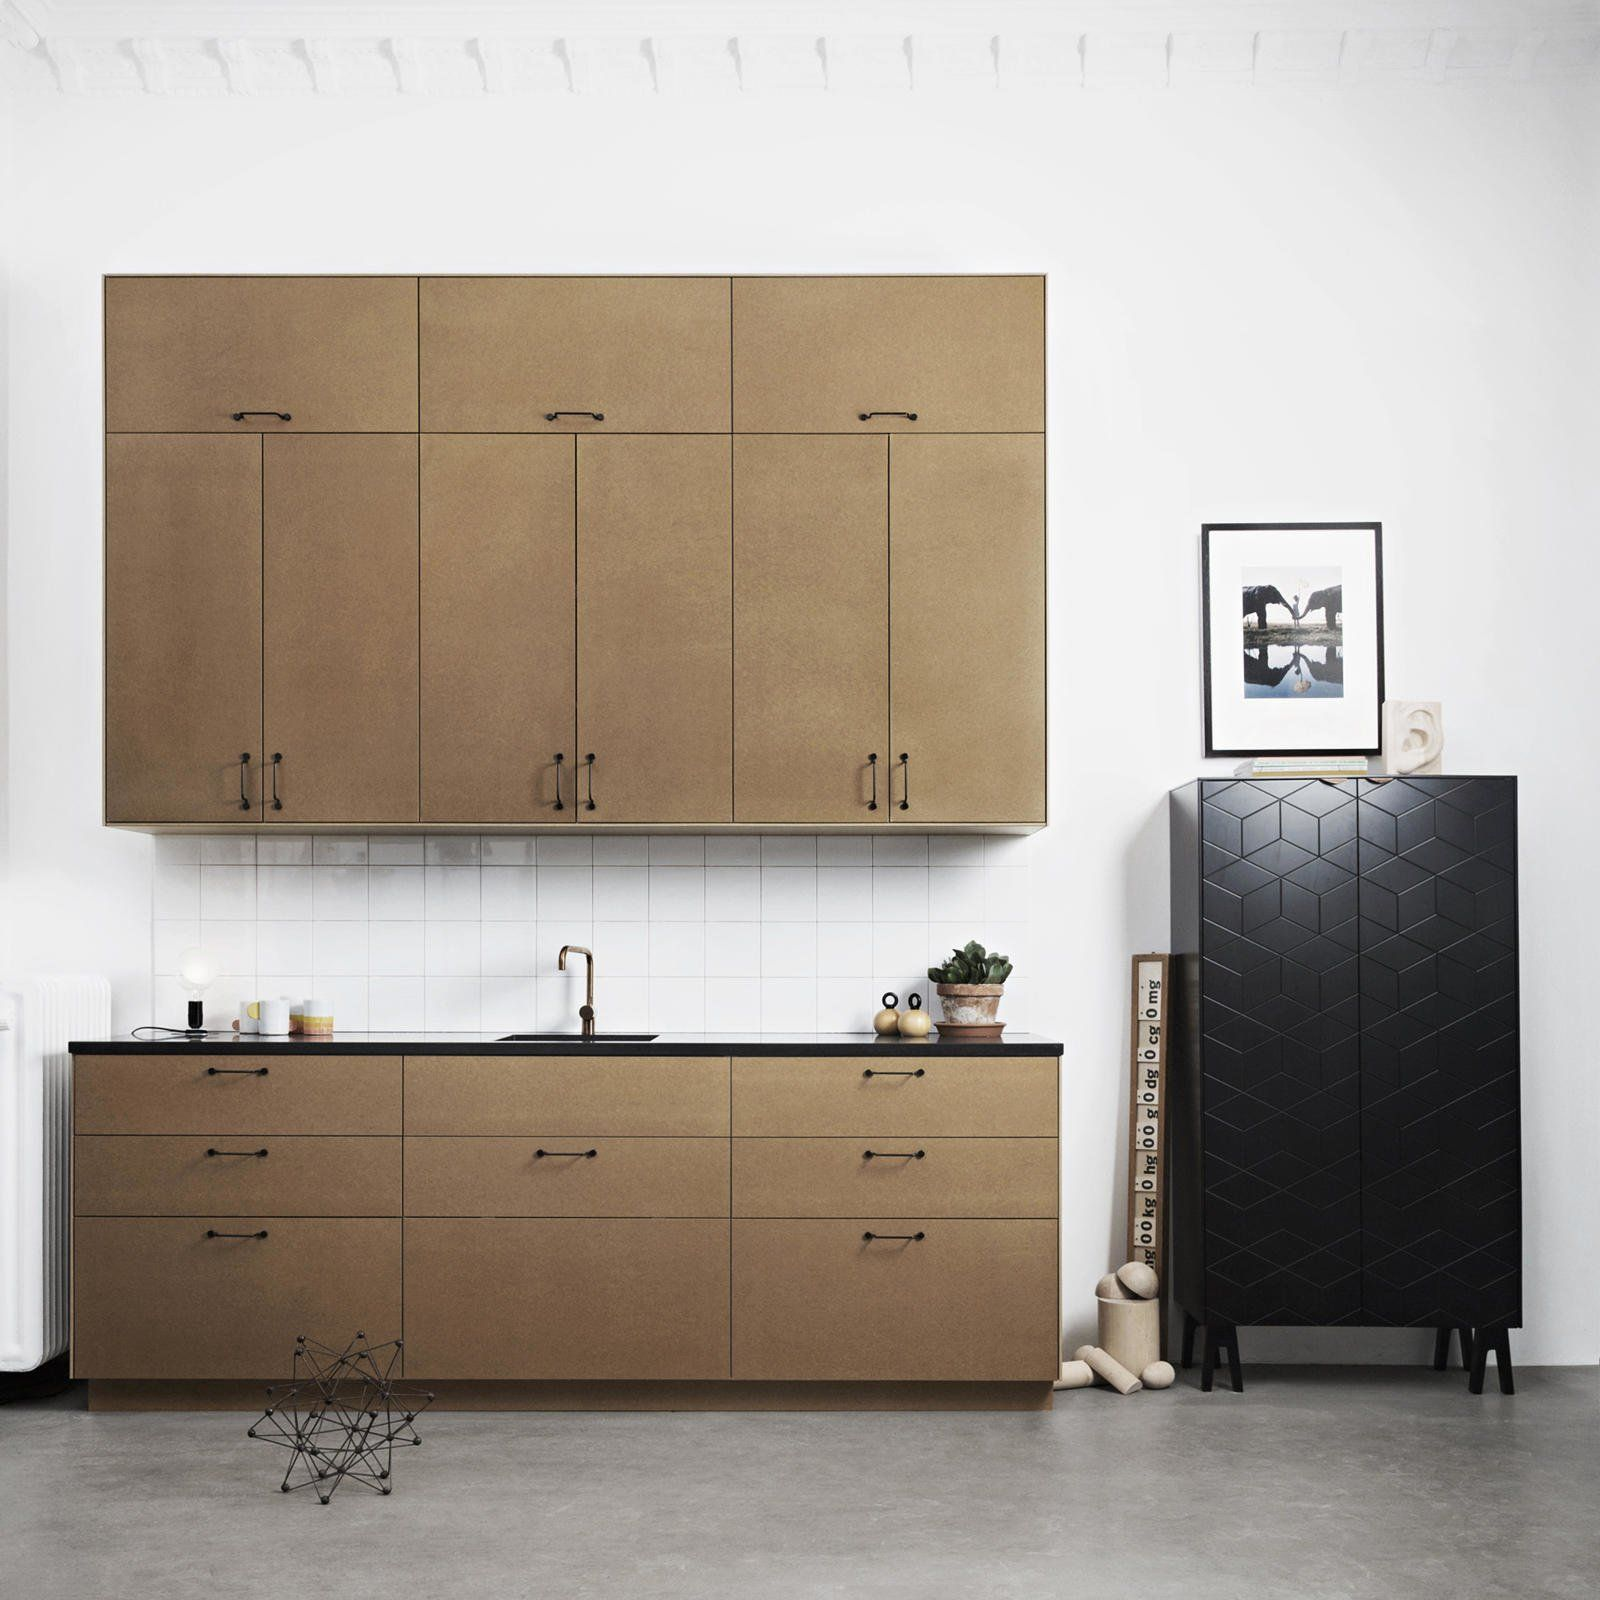 6 Companies That Will Upgrade Your Ikea Furniture For You Kuchen Inspiration Kuchen Mobel Und Kuchenmobel